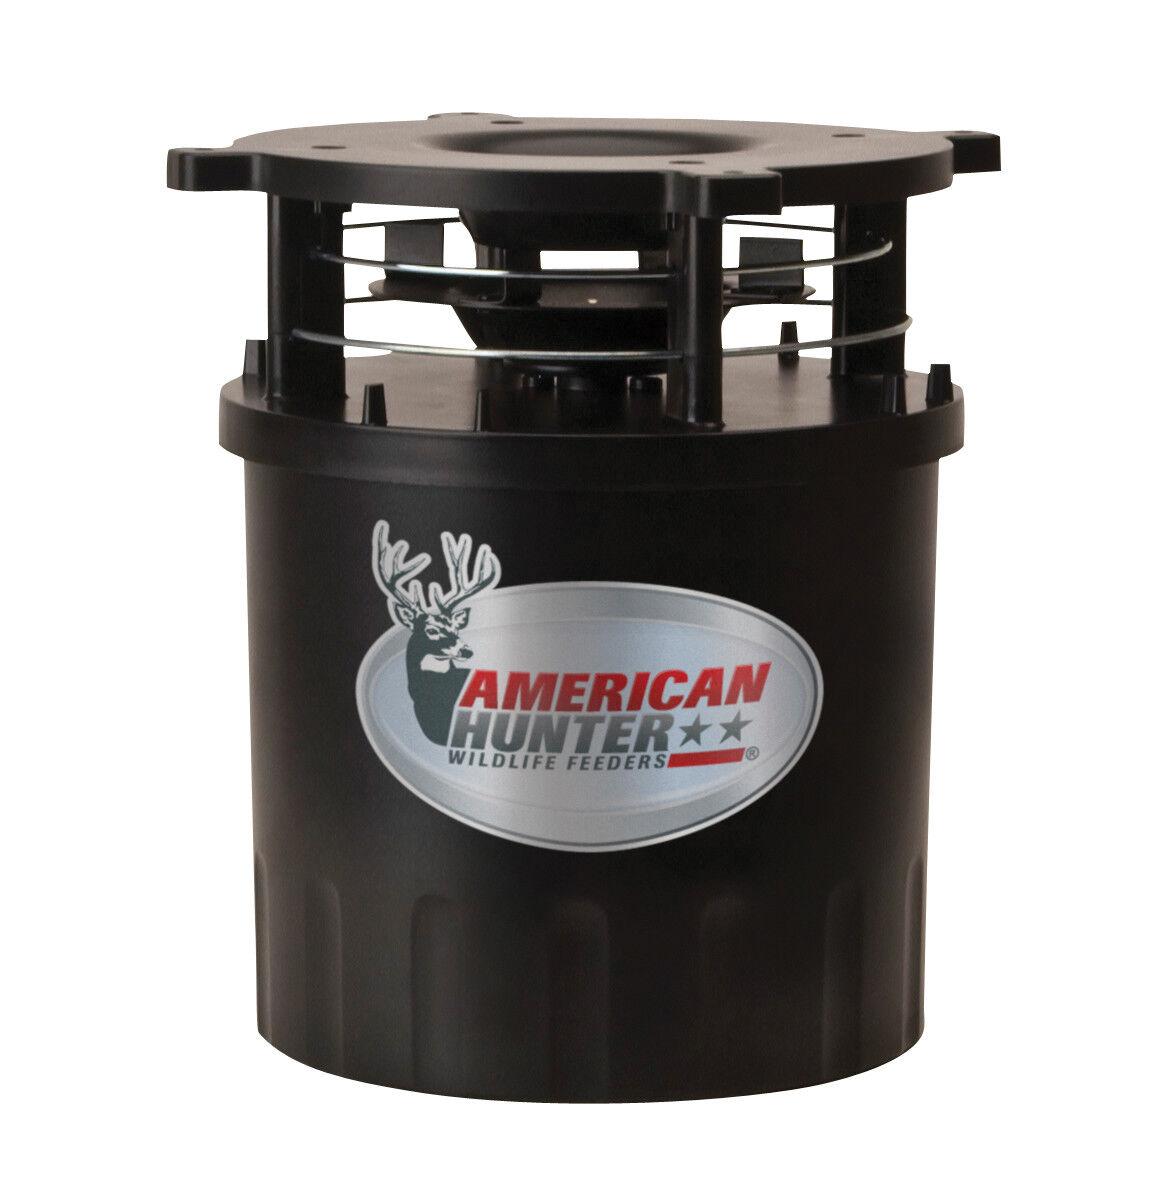 Nuevo American Hunter R-Pro Analógico Temporizador Alimentador Kit